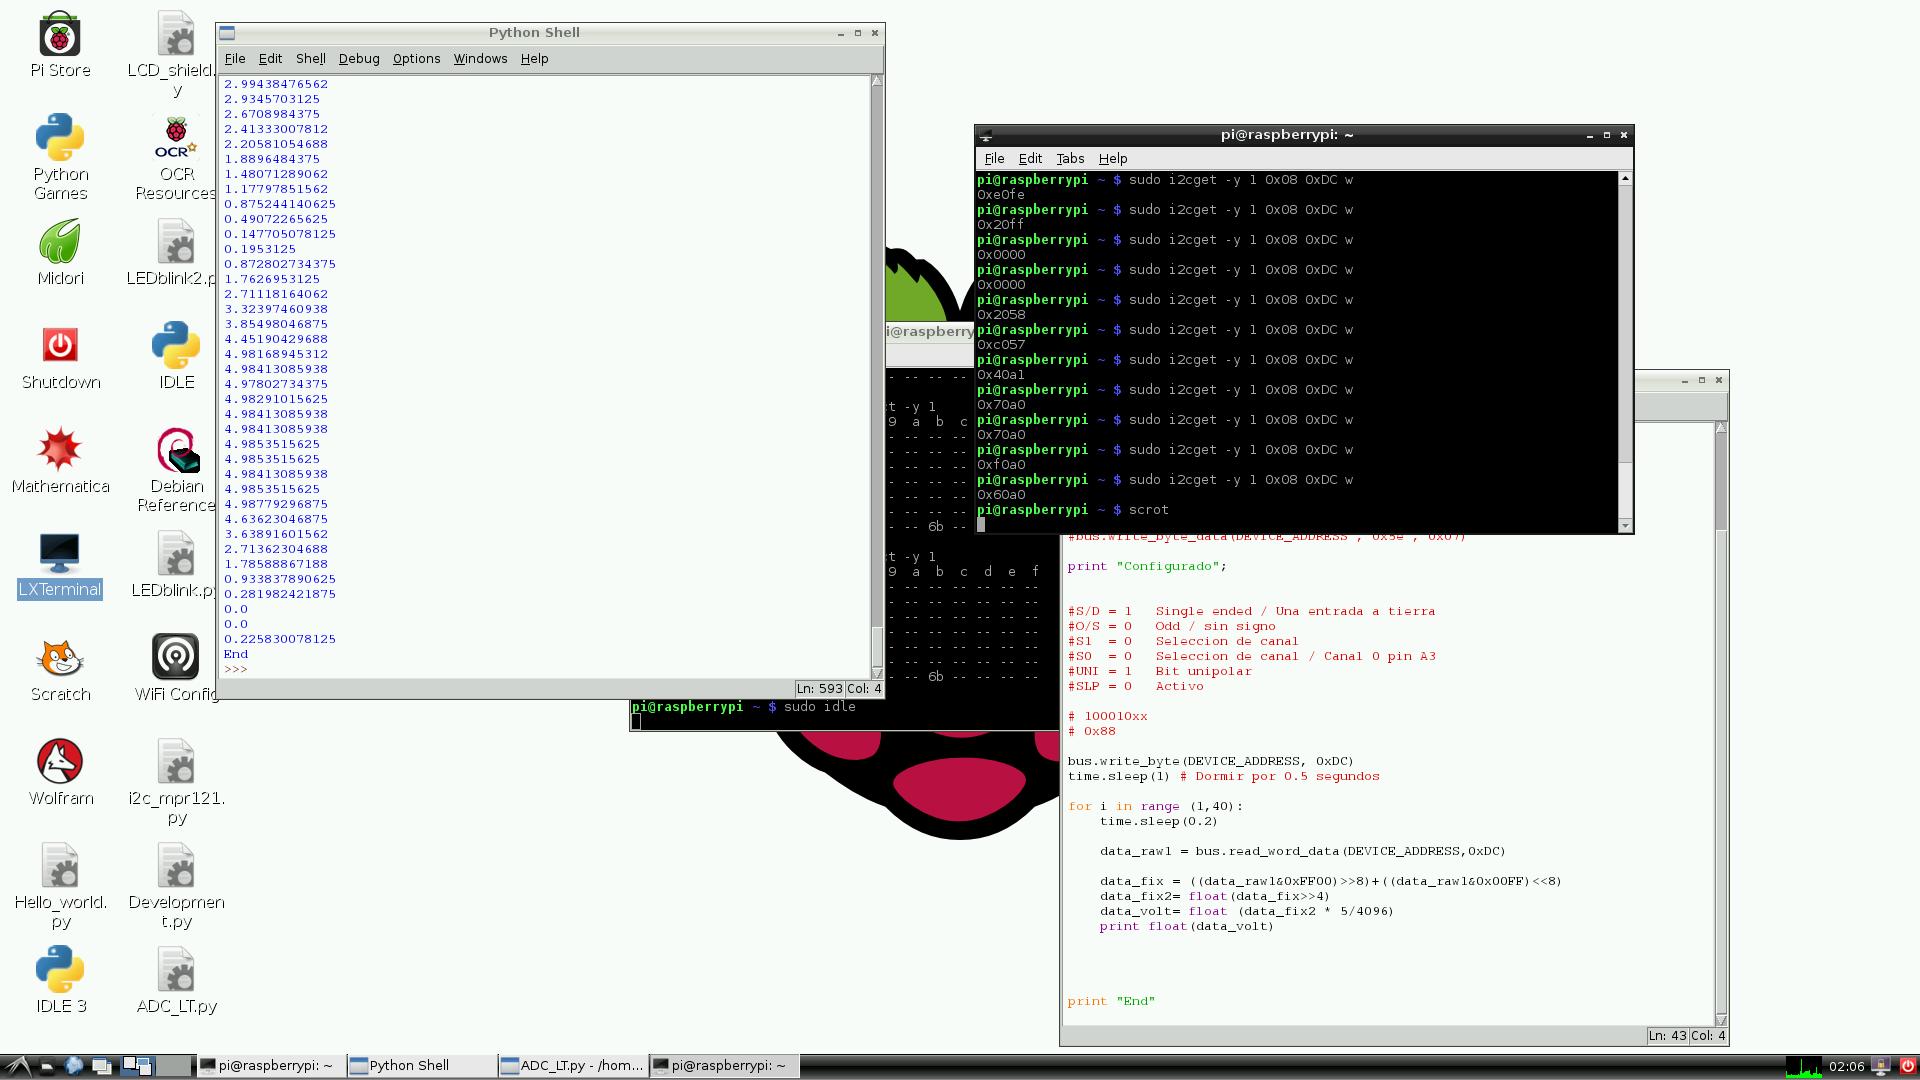 Raspberry Pi ADC LTC2309